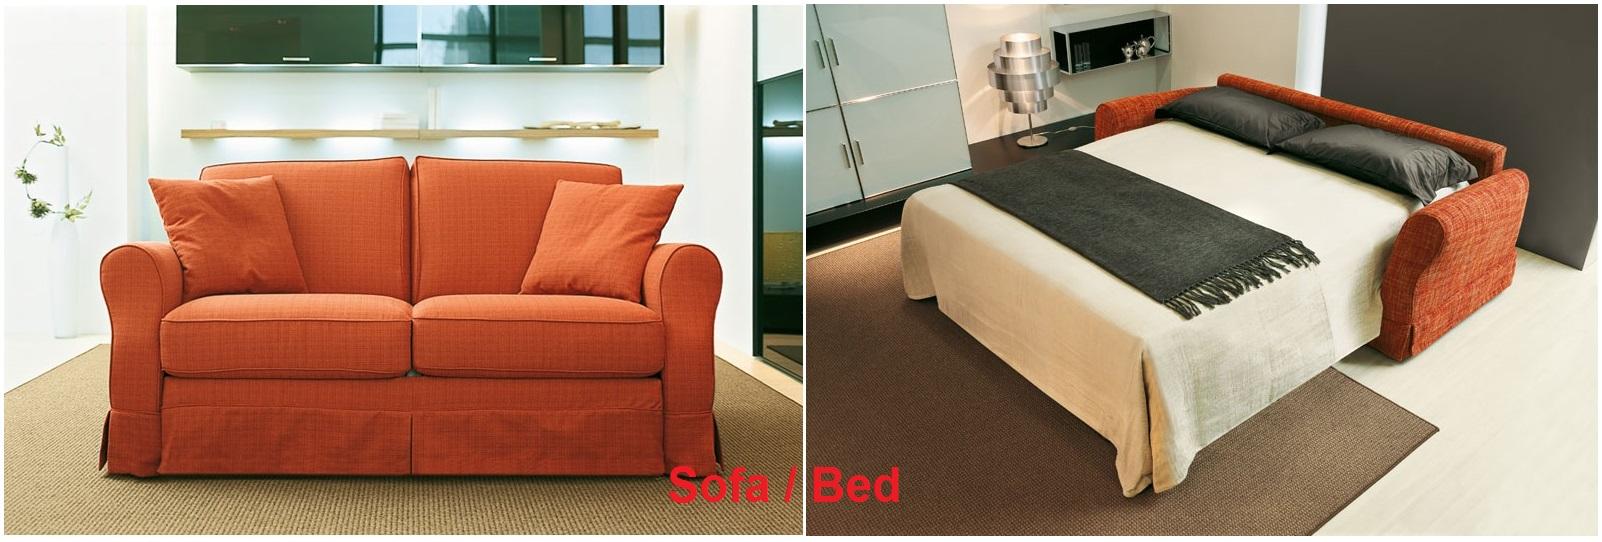 Multifunctional Bedroom Furniture 28 Images Multifunctional Modular Furniture For Bedrooms